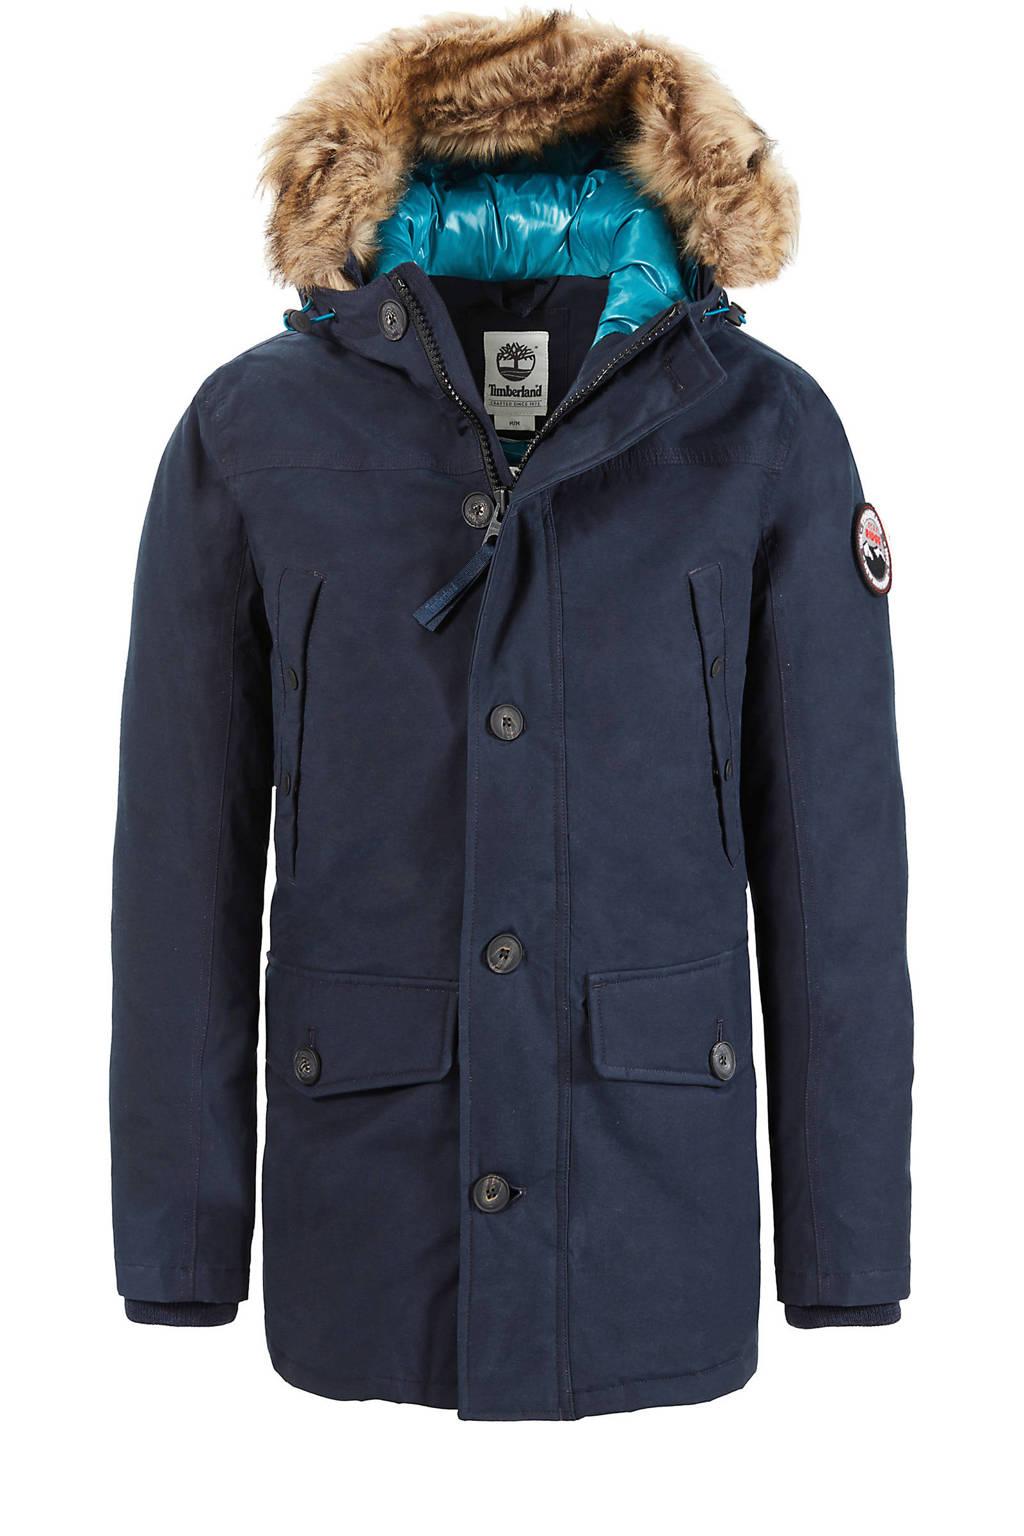 Timberland winterjas met dons donkerblauw, Donkerblauw